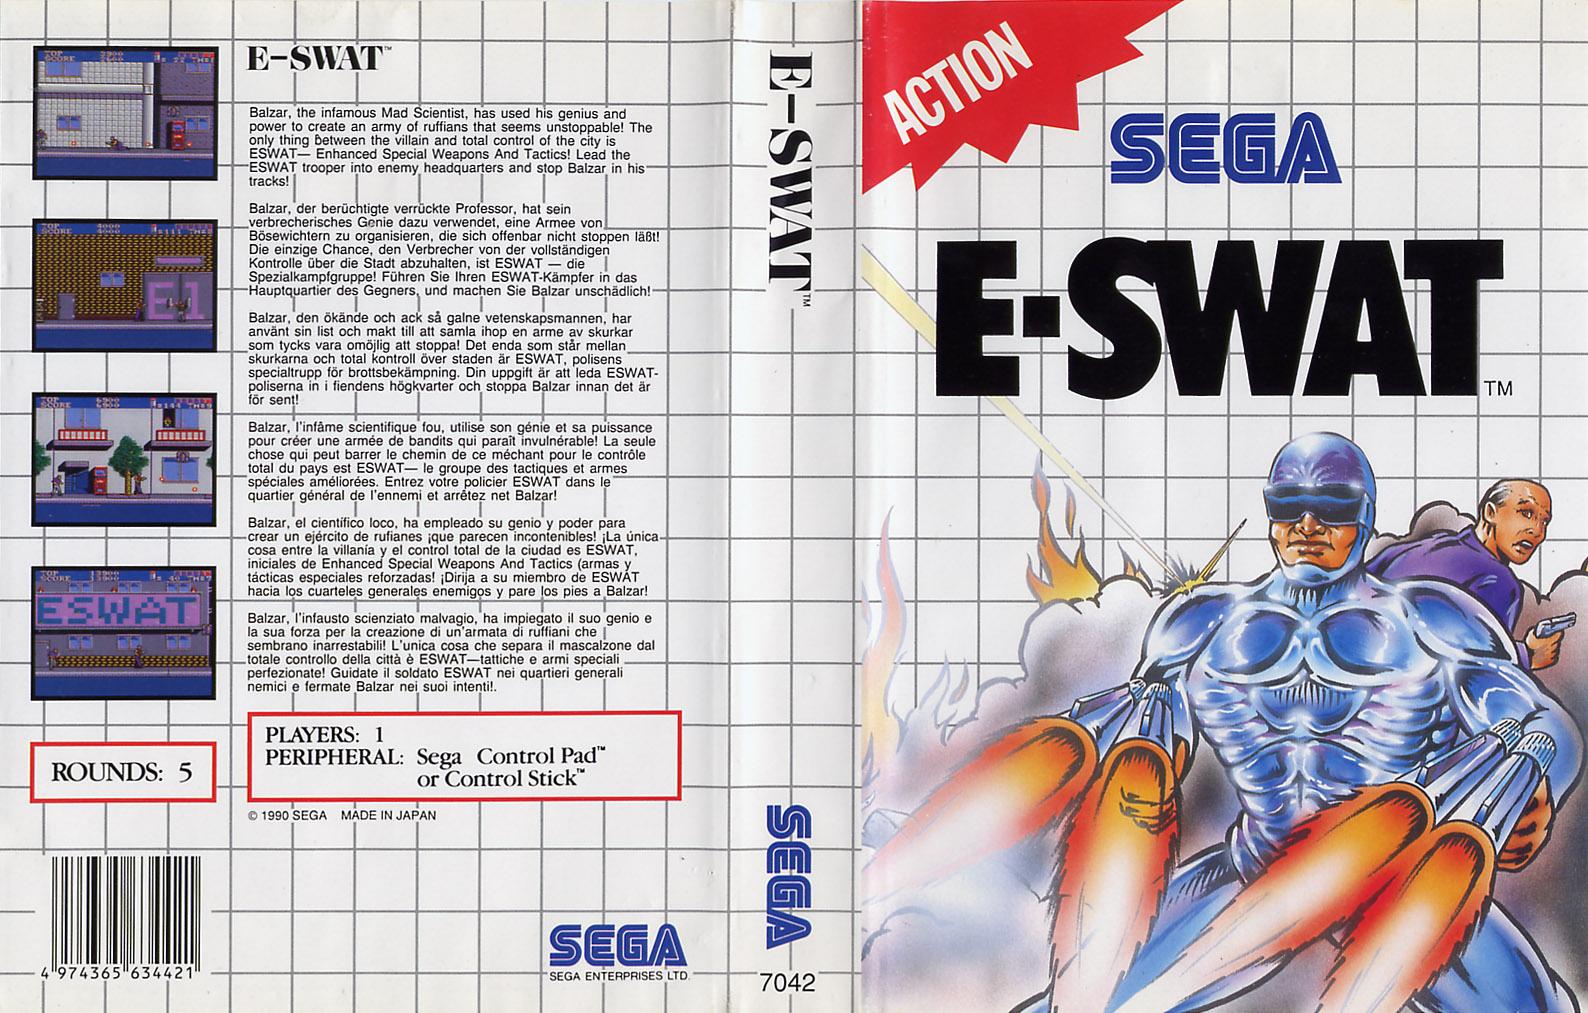 http://www.smspower.org/uploads/Scans/ESWAT-SMS-EU.jpg